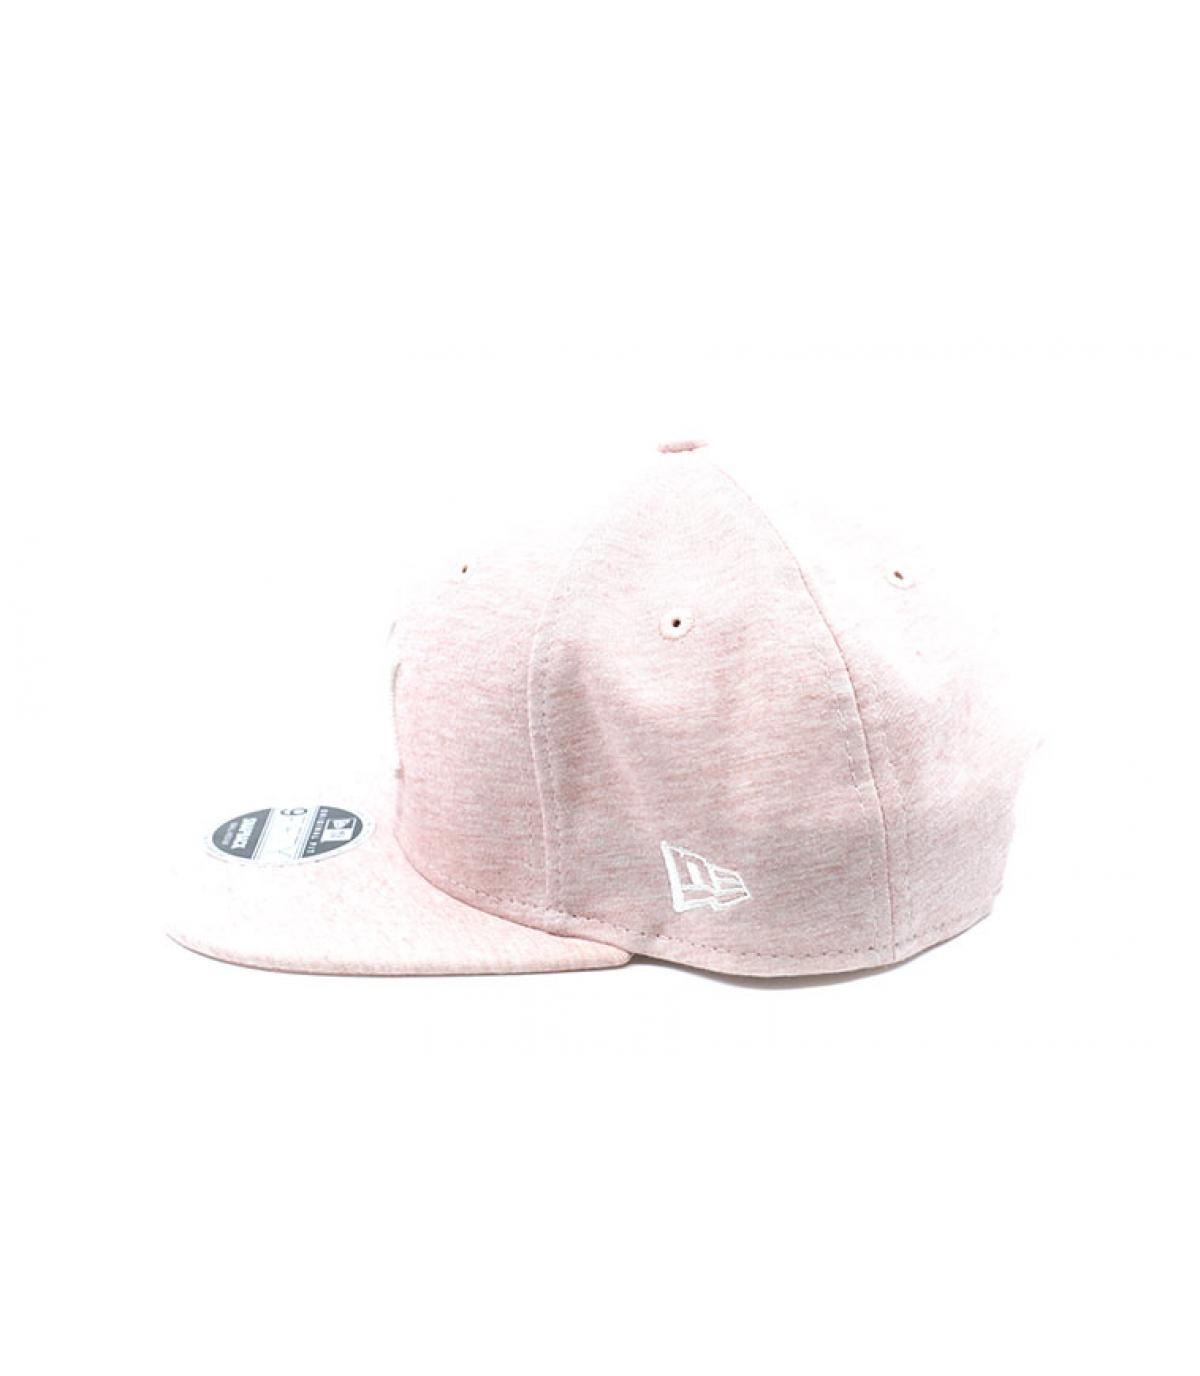 Details Snapback Jersey Brights 9Fifty NY pink - Abbildung 4